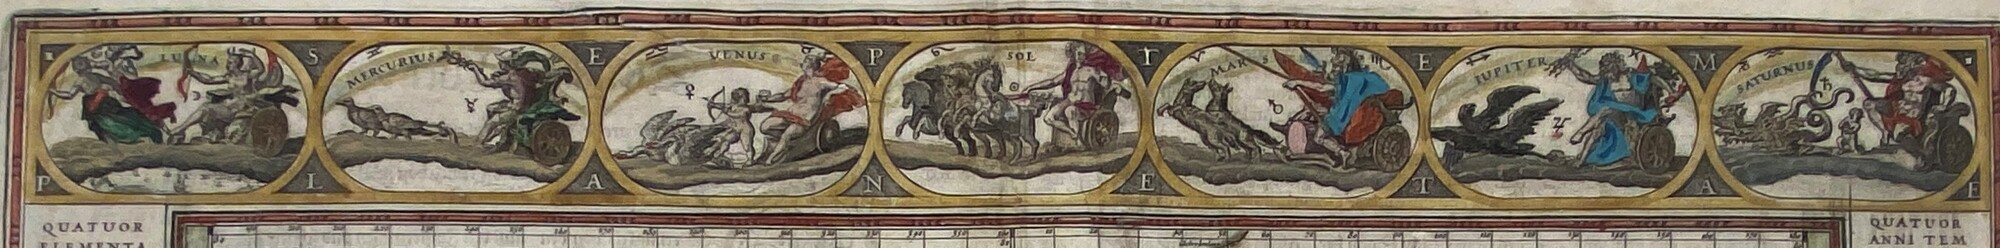 Nova Totius Terrarum Orbis Geographica ac Hydrographica Tabula